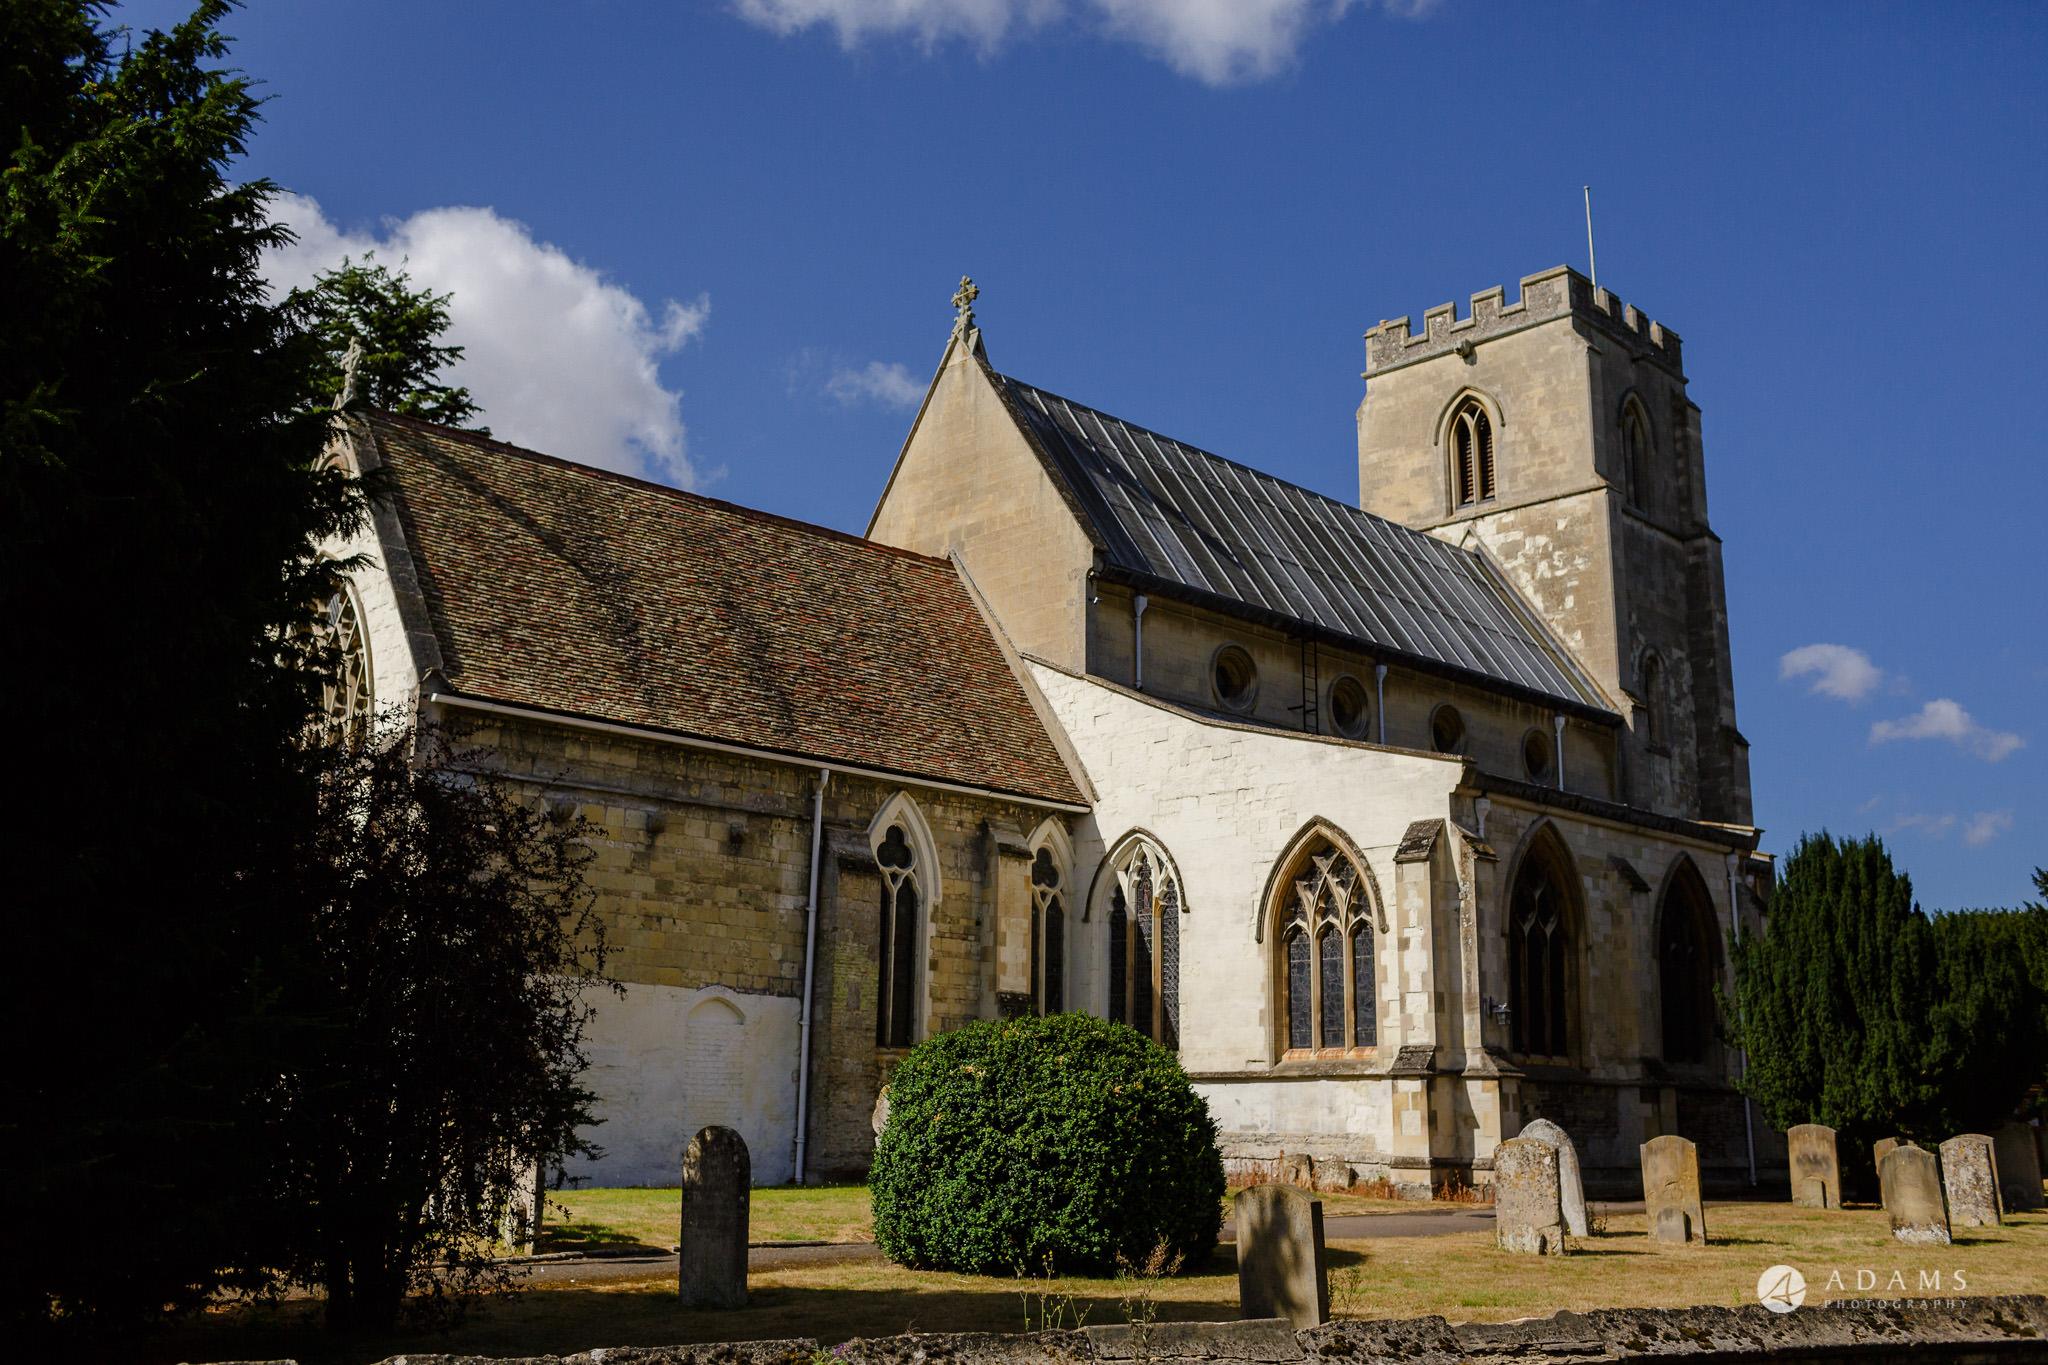 Trinity College Cambridge wedding church